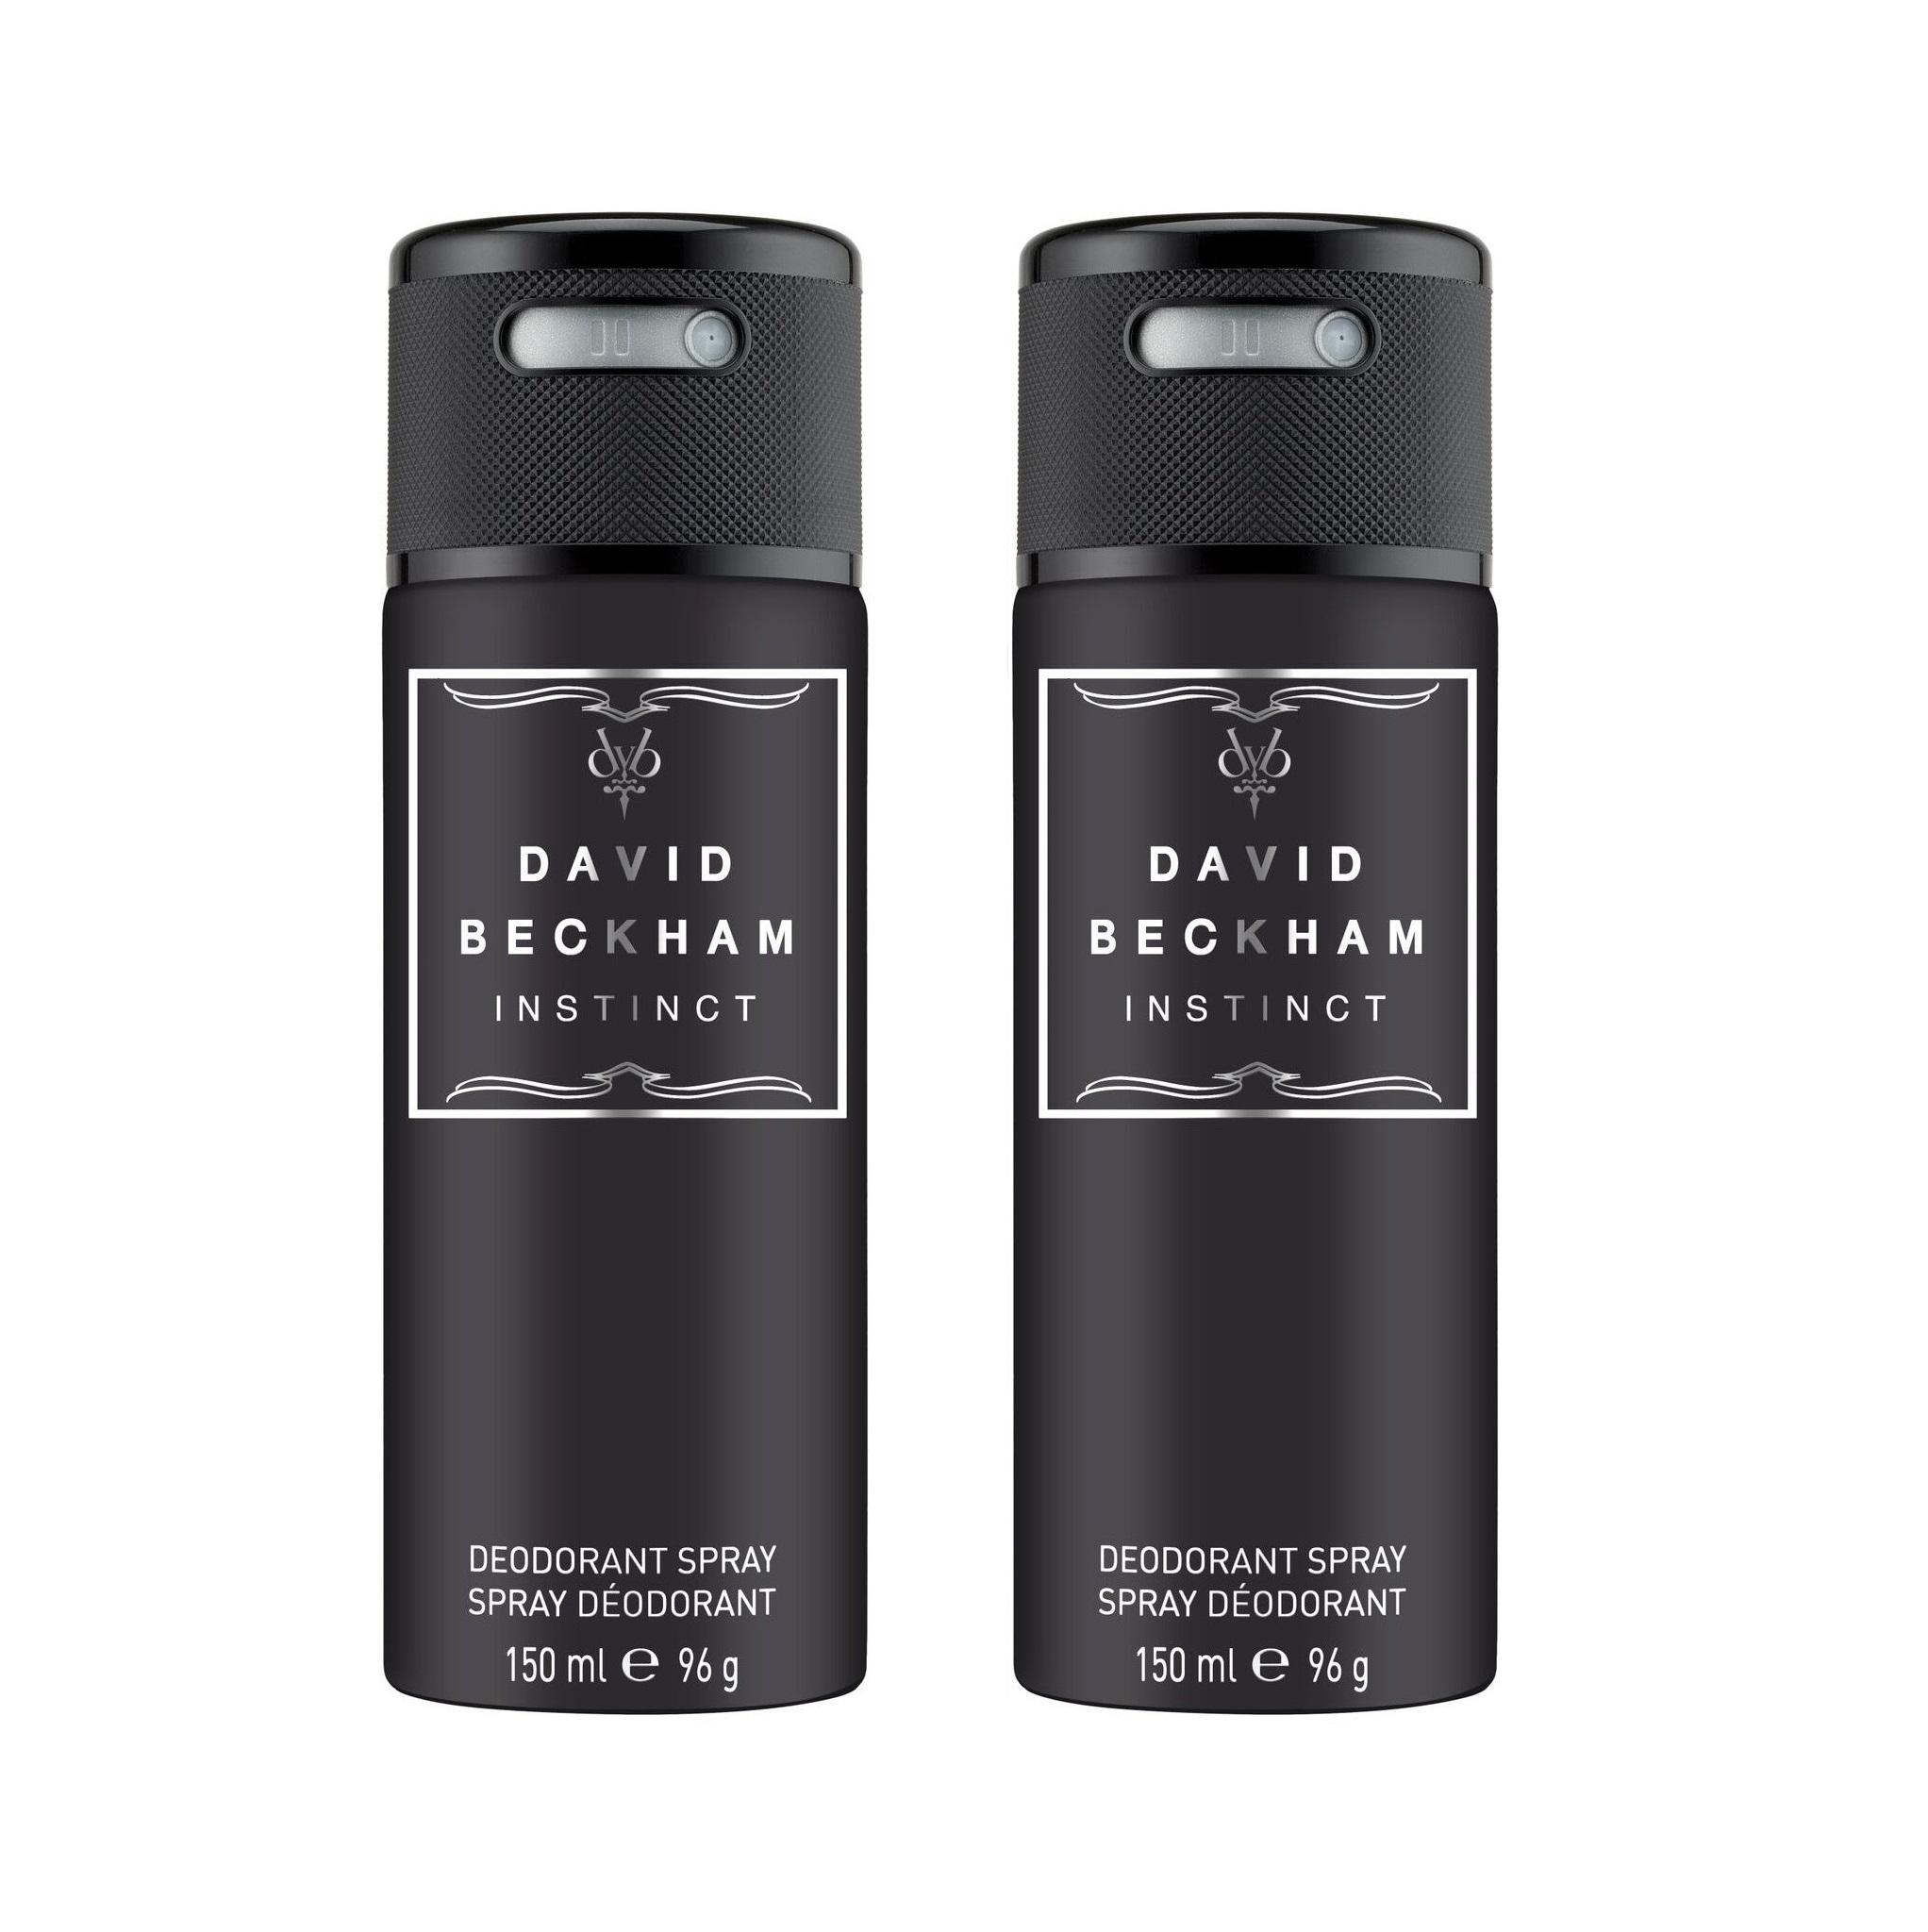 David Beckham - 2x Instinct Deodorant Spray 150 ml